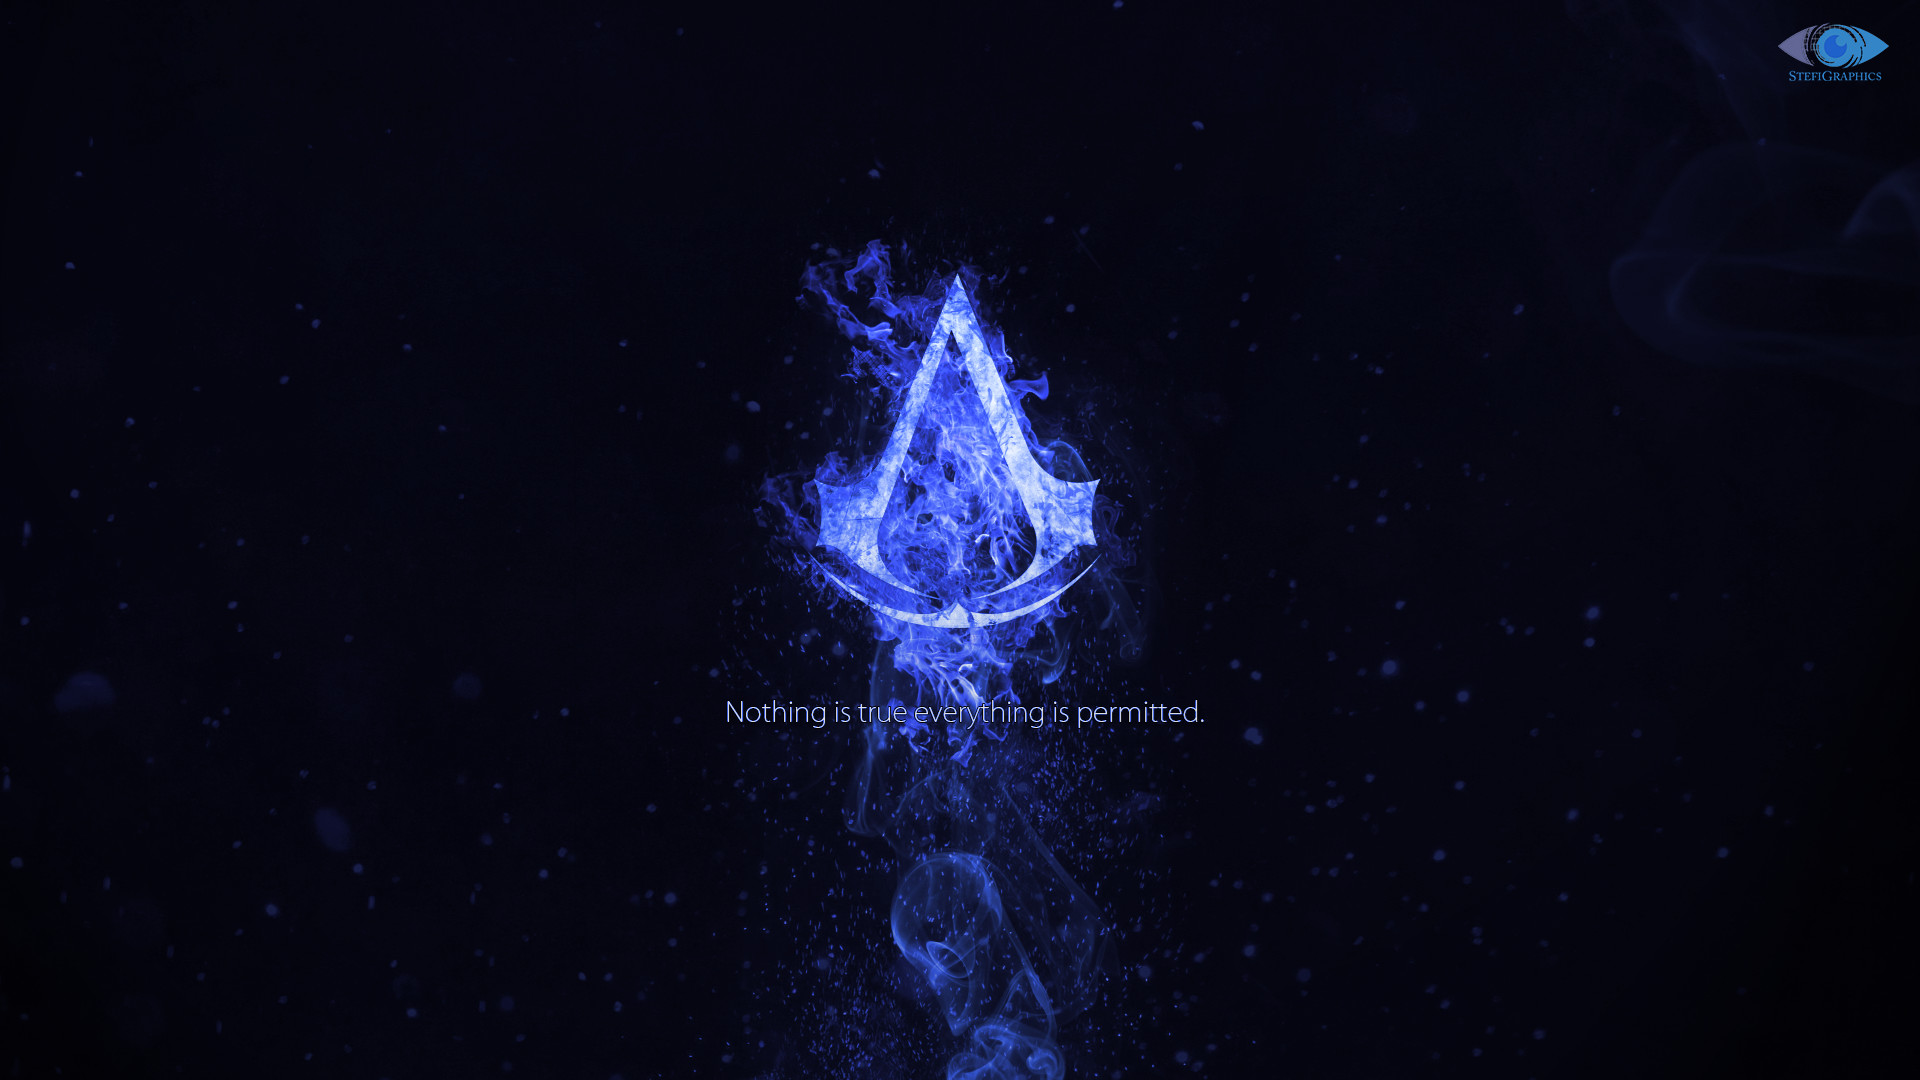 1920x1080 Assassins Creed Logo Wallpaper Download The